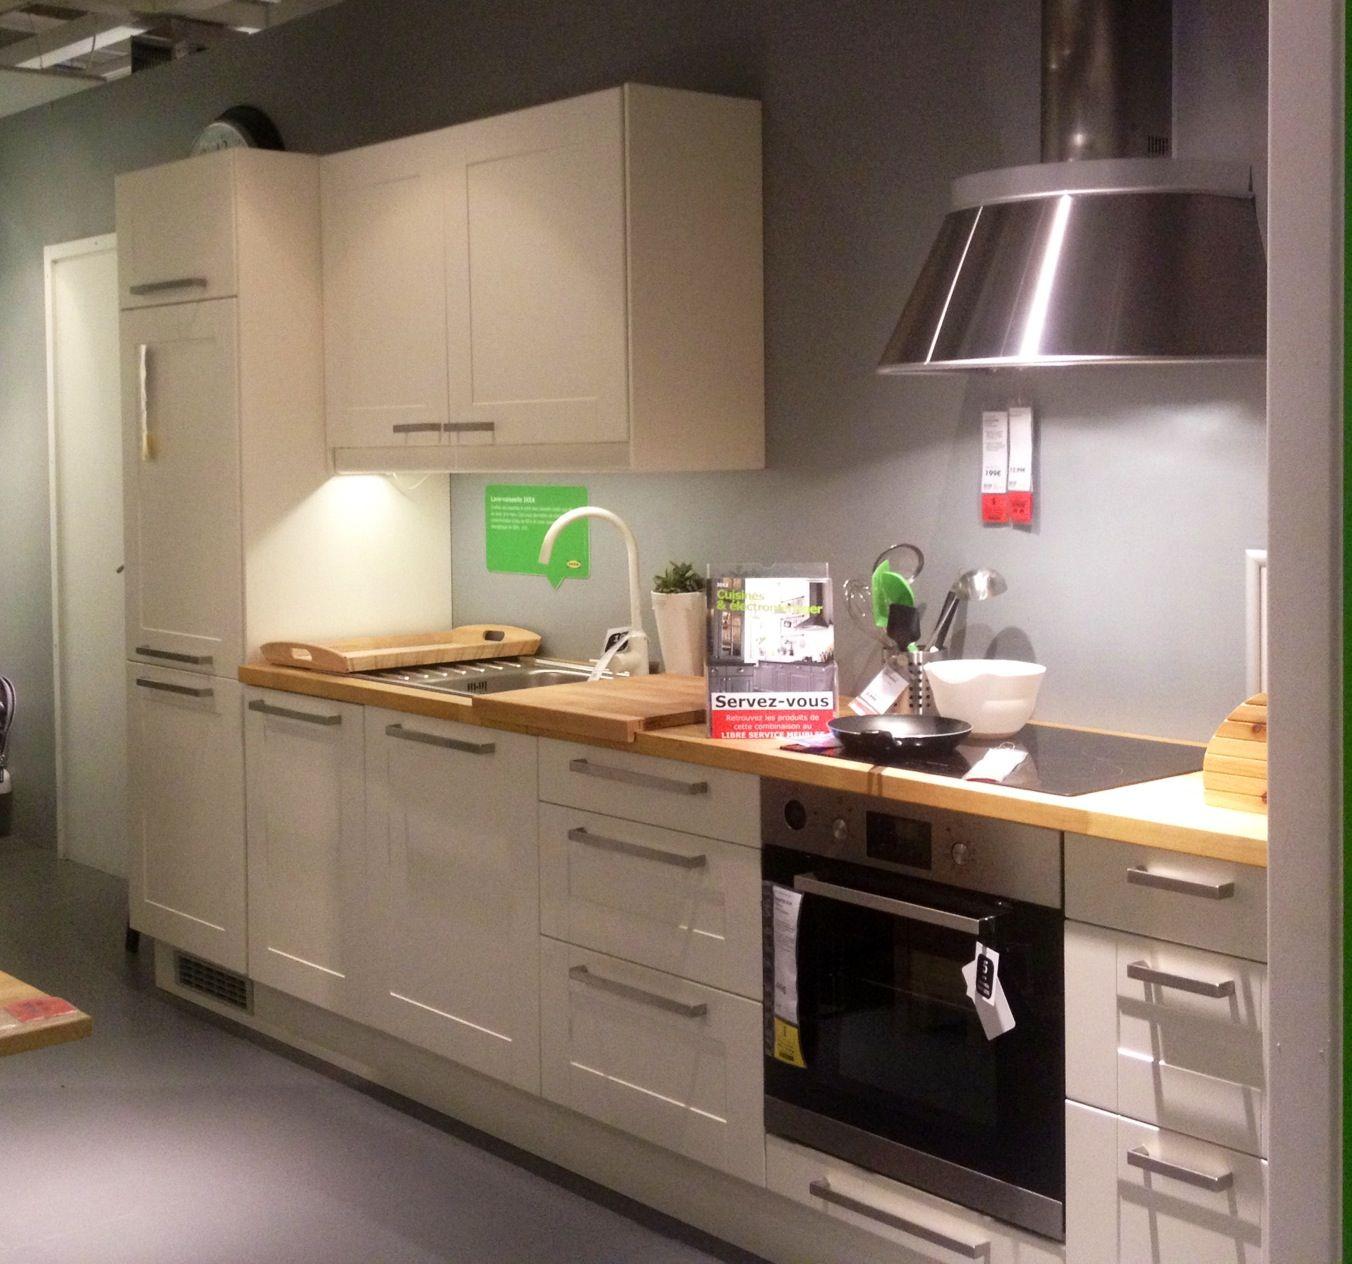 Shaker Style Kitchen Ikea Kitchen And Kitchenware Pinterest - Ikea kitchenware